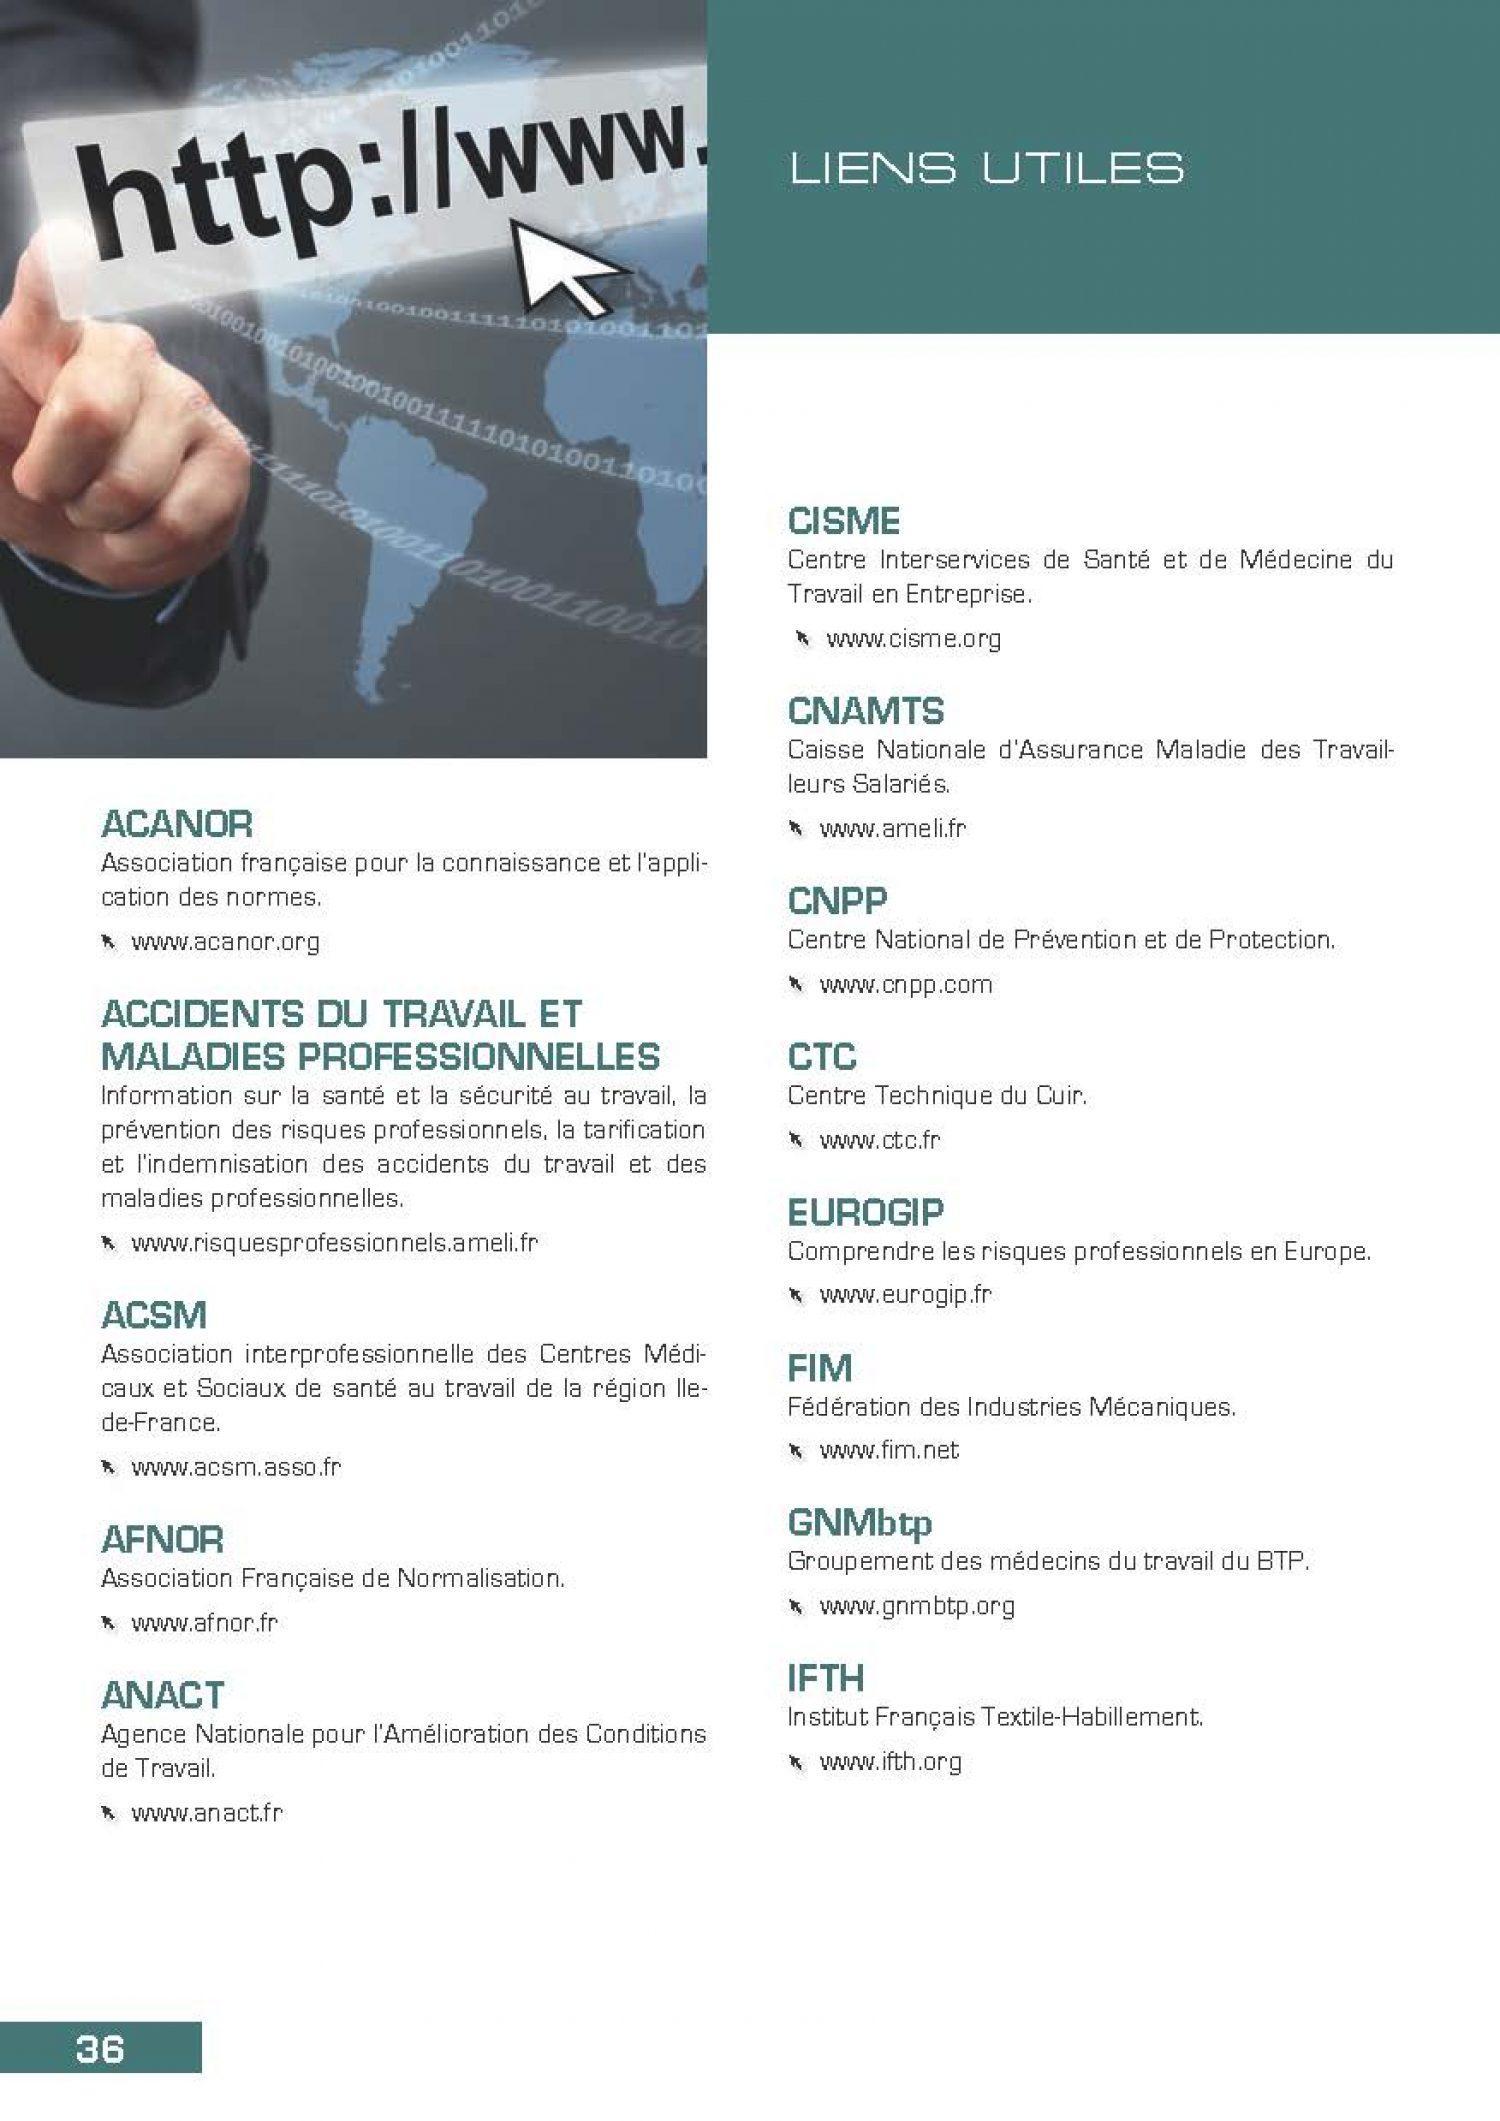 Guide Securite au Travail 2014 HDpdf_Page_36